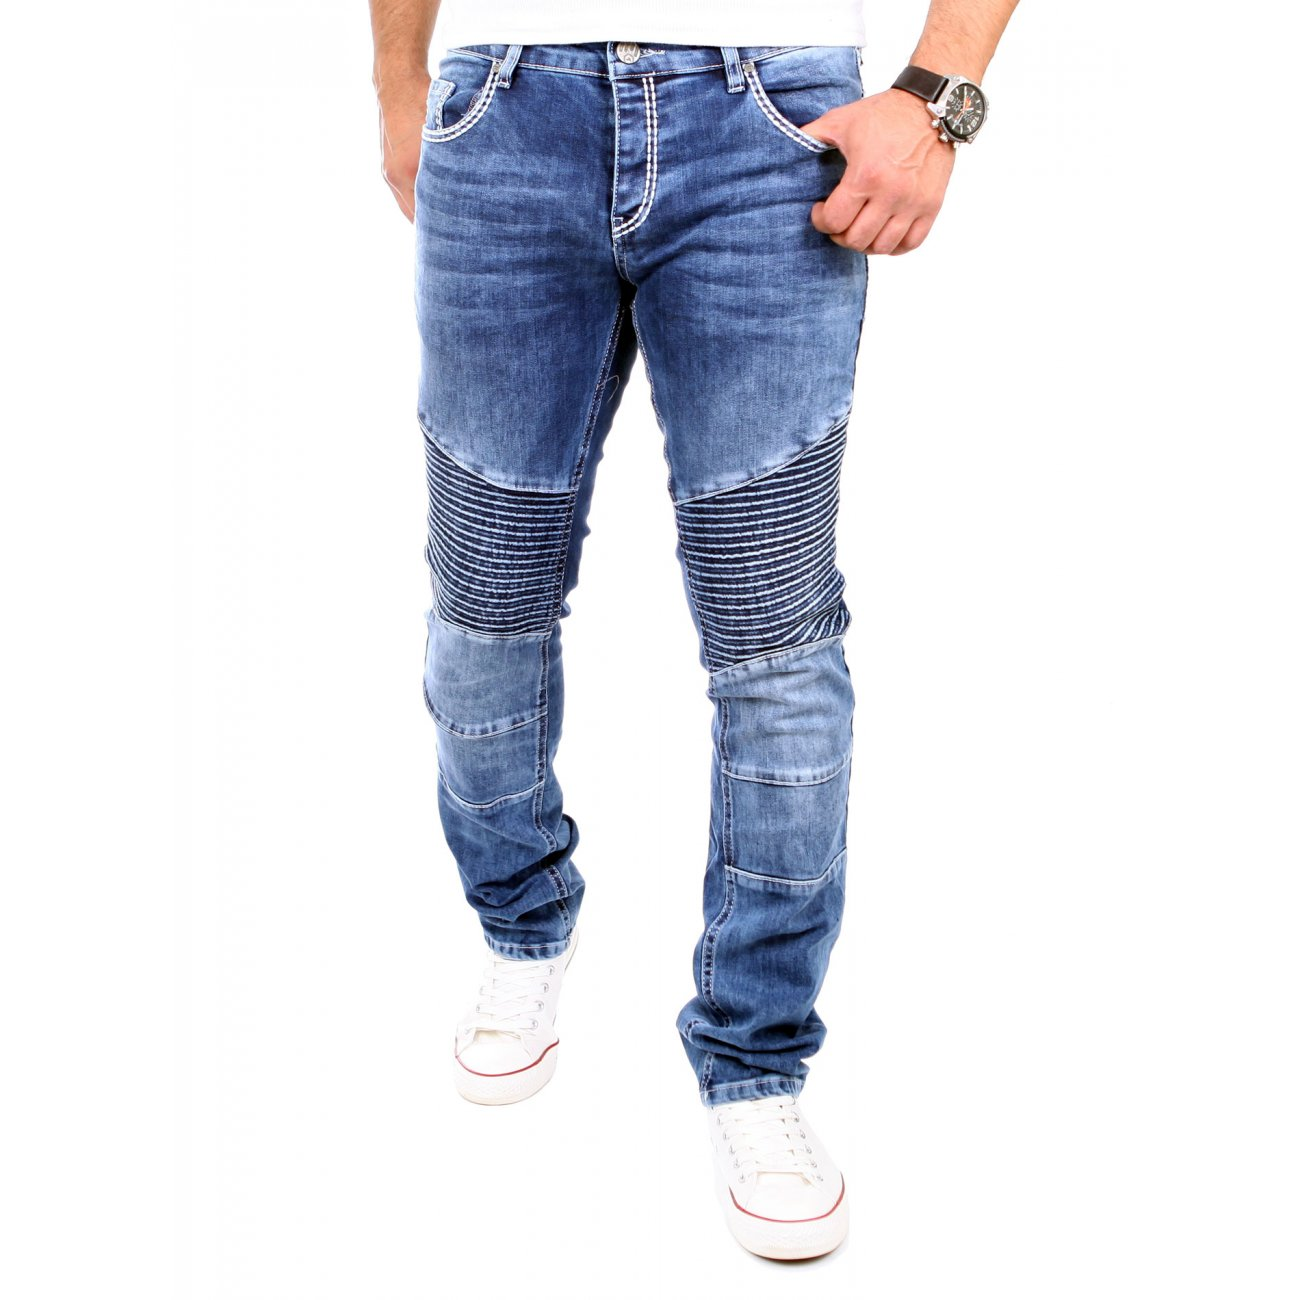 tazzio jeans herren denim biker jeanshose tz 16528 blau. Black Bedroom Furniture Sets. Home Design Ideas